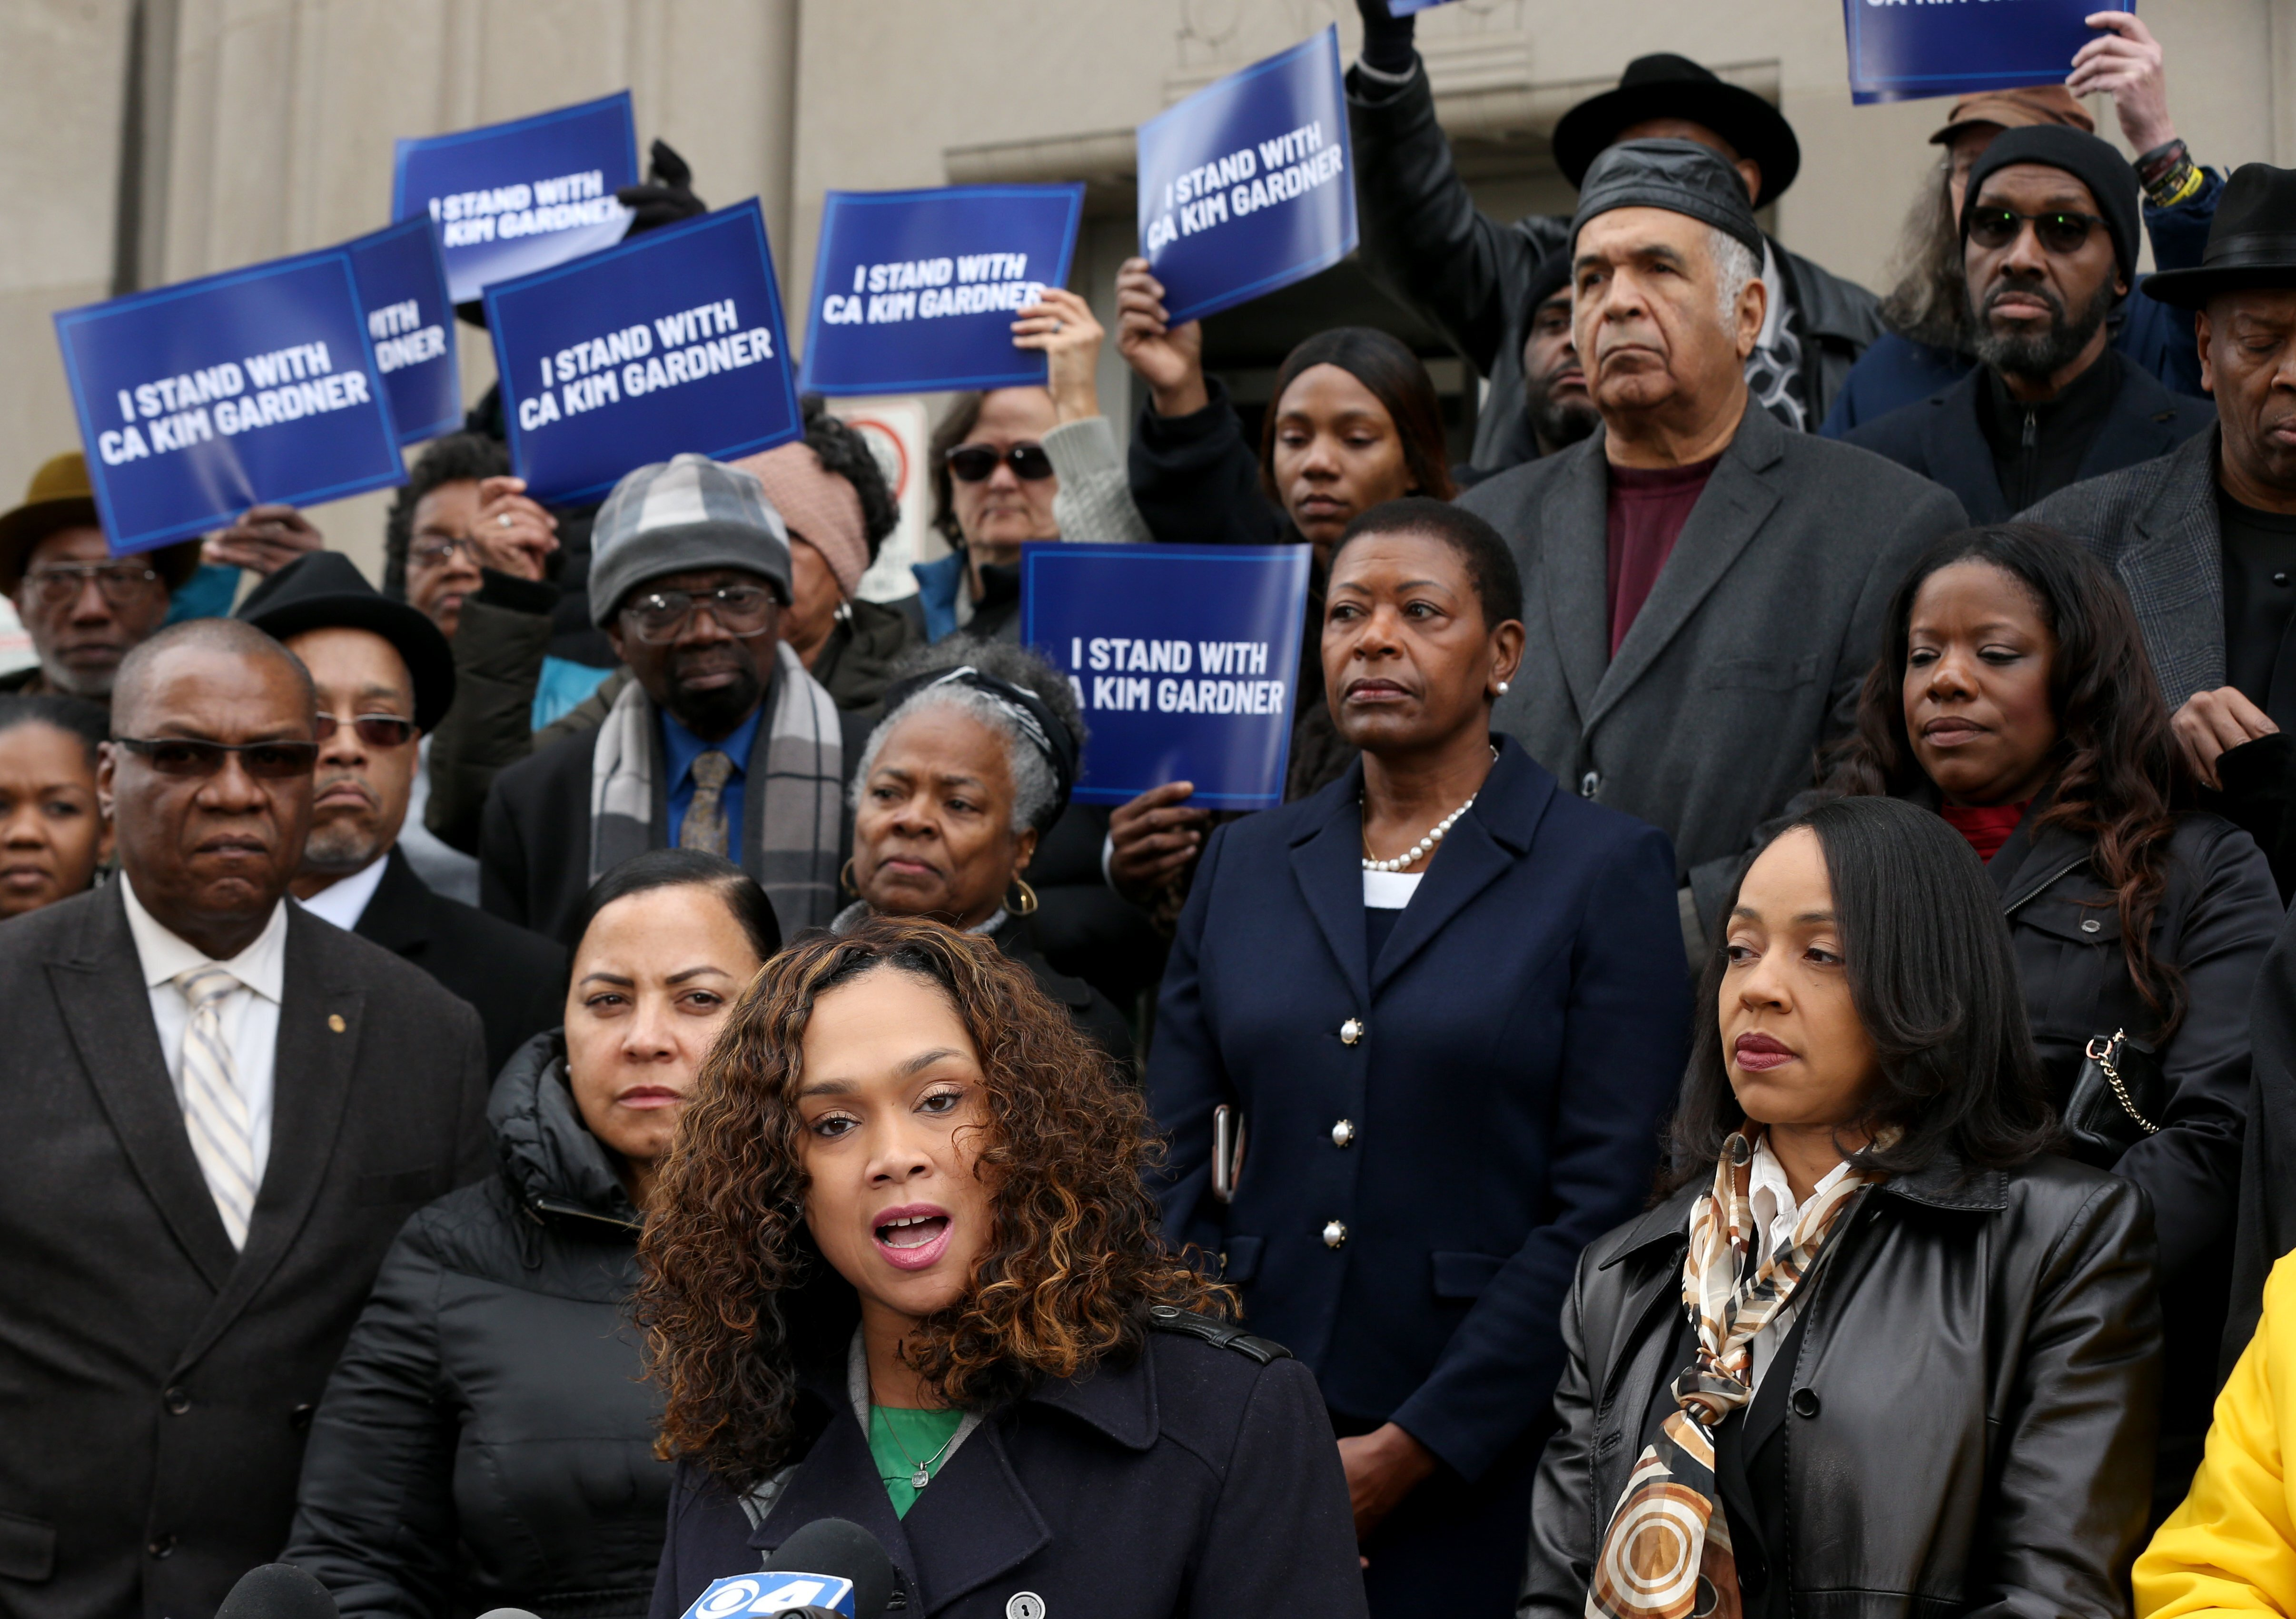 Black prosecutors back Gardner, say theyve faced resistance